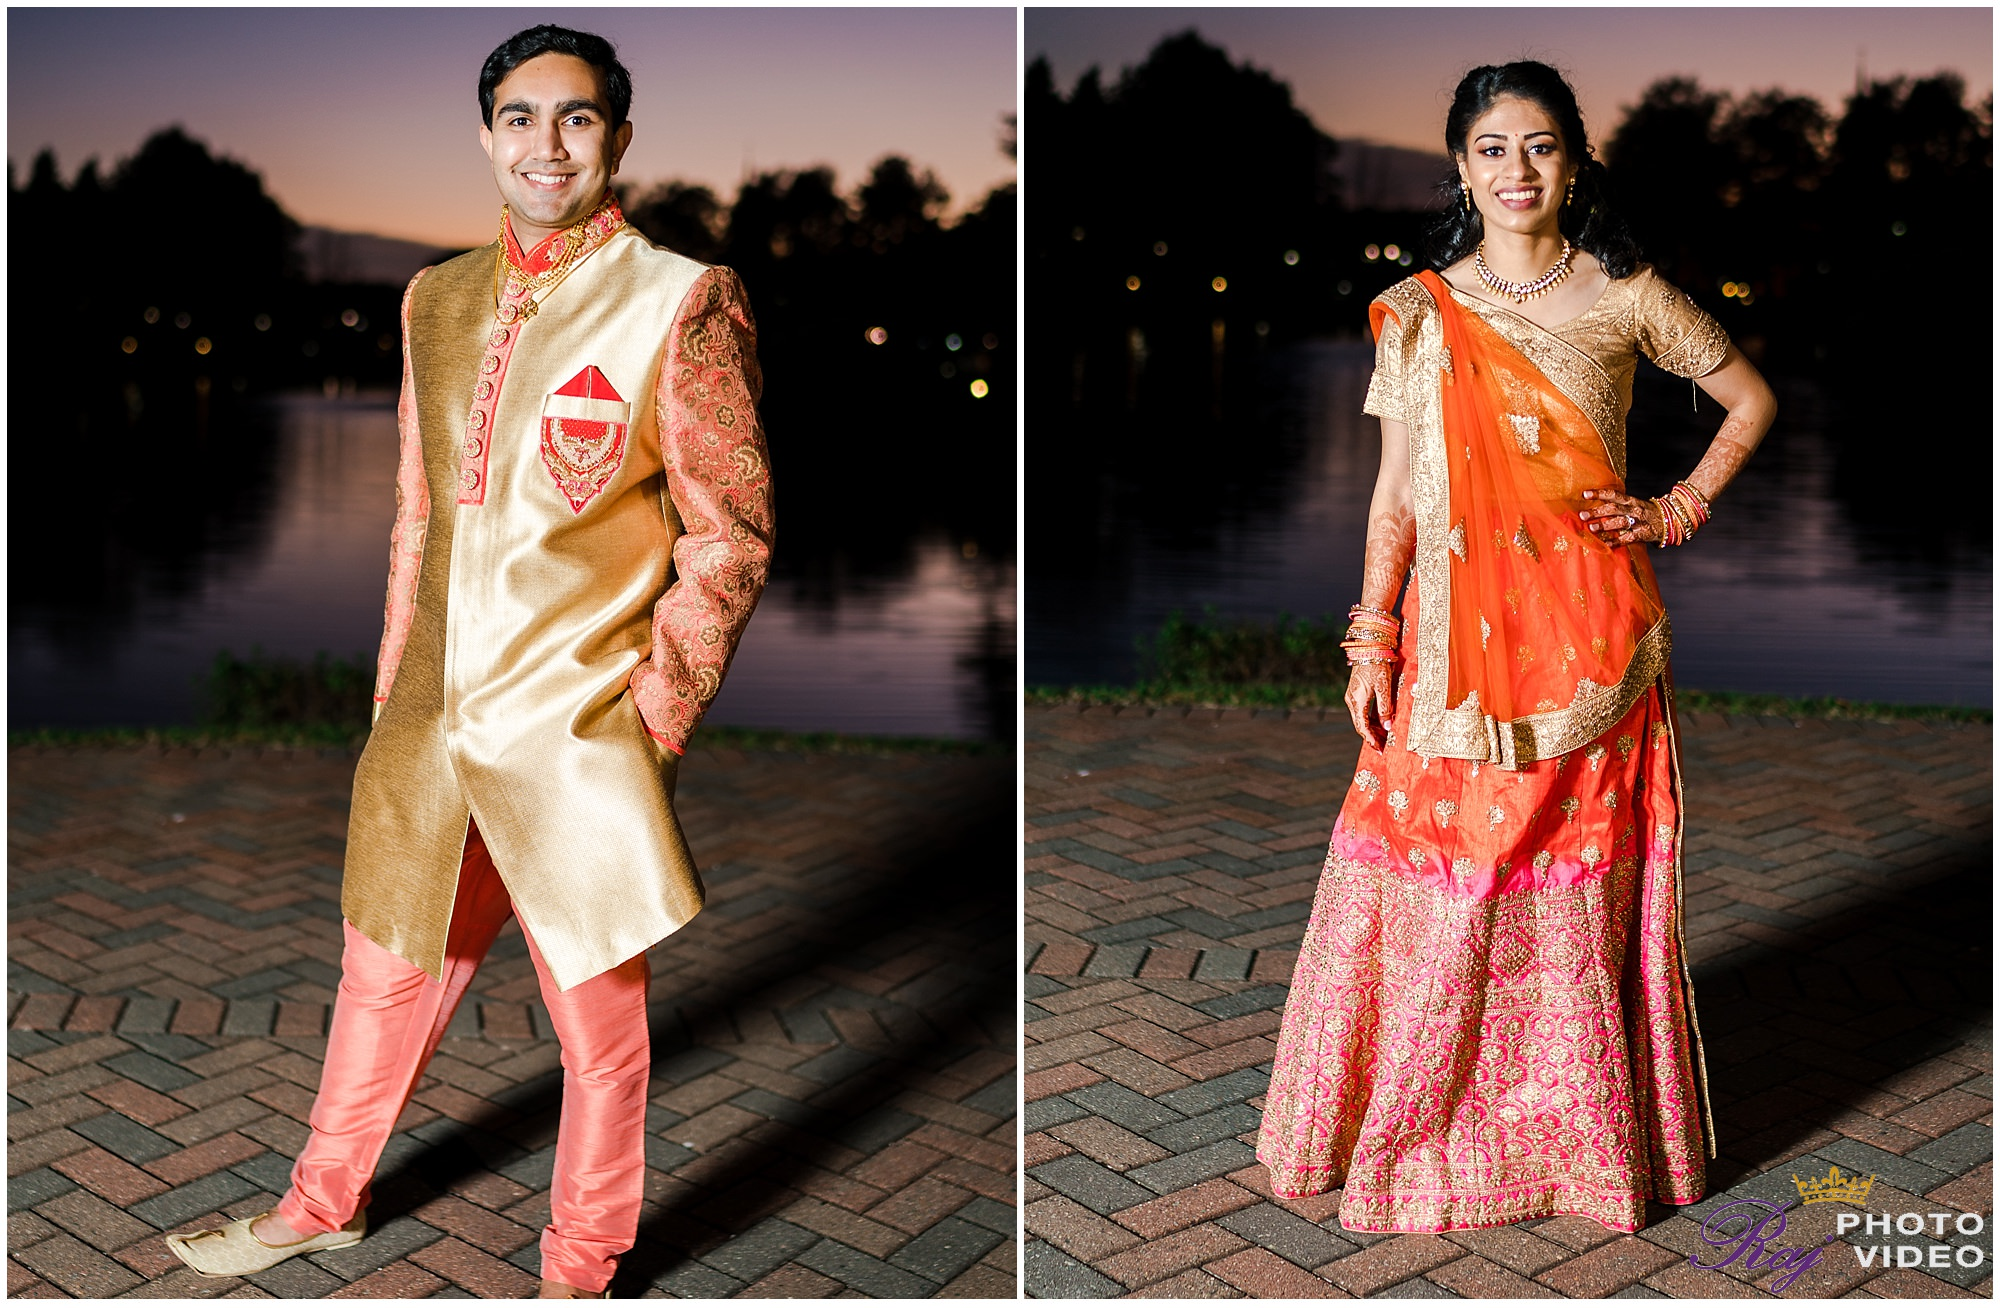 Founders-Inn-and-Spa-Virginia-Beach-VA-Indian-Wedding-Harini-Vivek-8.jpg